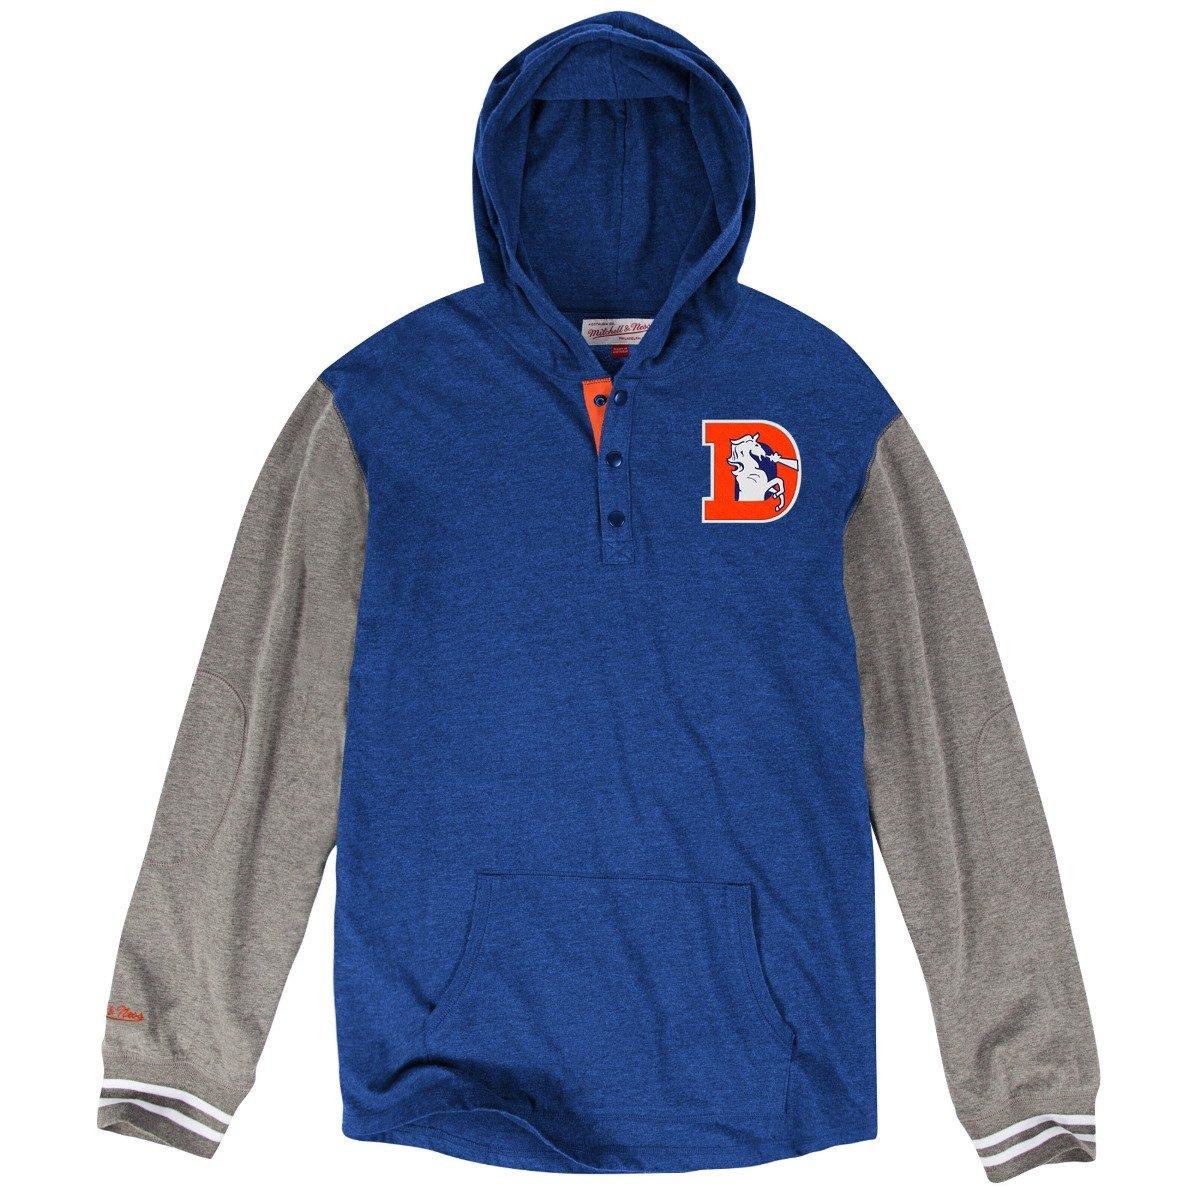 Denver Broncos Mitchell & Ness NFL mid-season」長袖フード付きメンズシャツ XXX-Large  B01II7KTBG